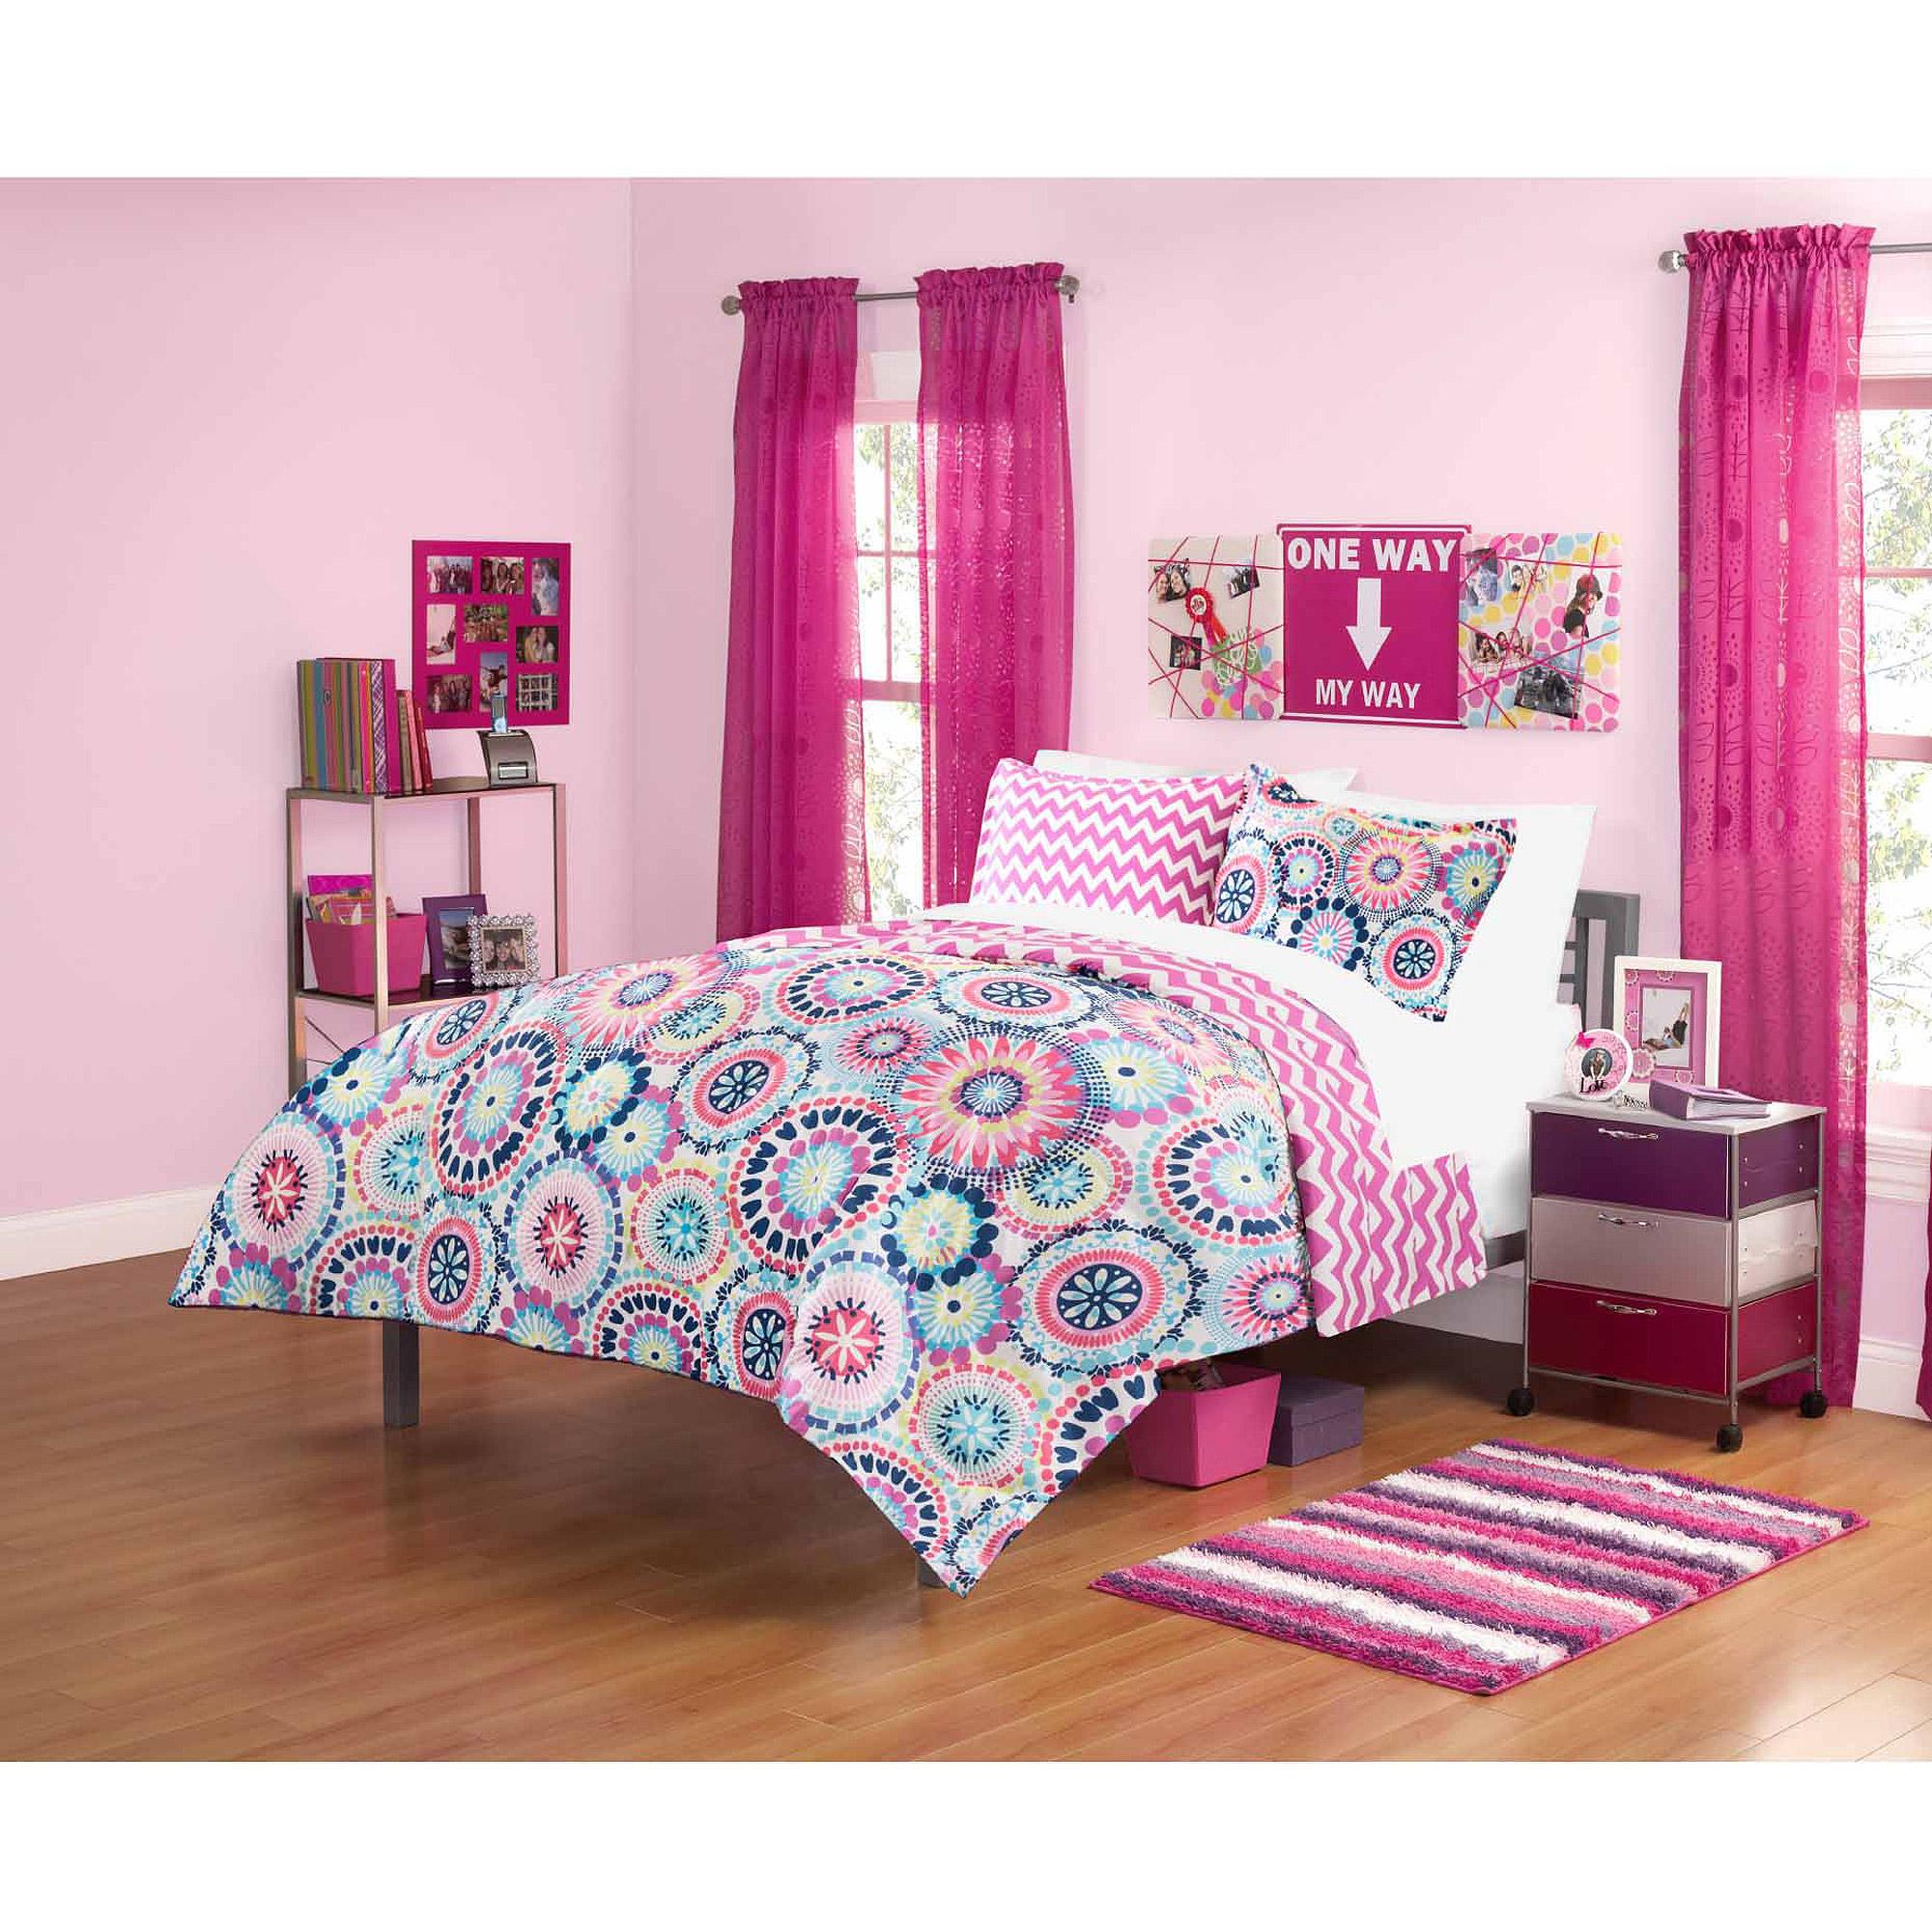 Bedding sets for teenage girls walmart - Bedding Sets For Teenage Girls Walmart 49